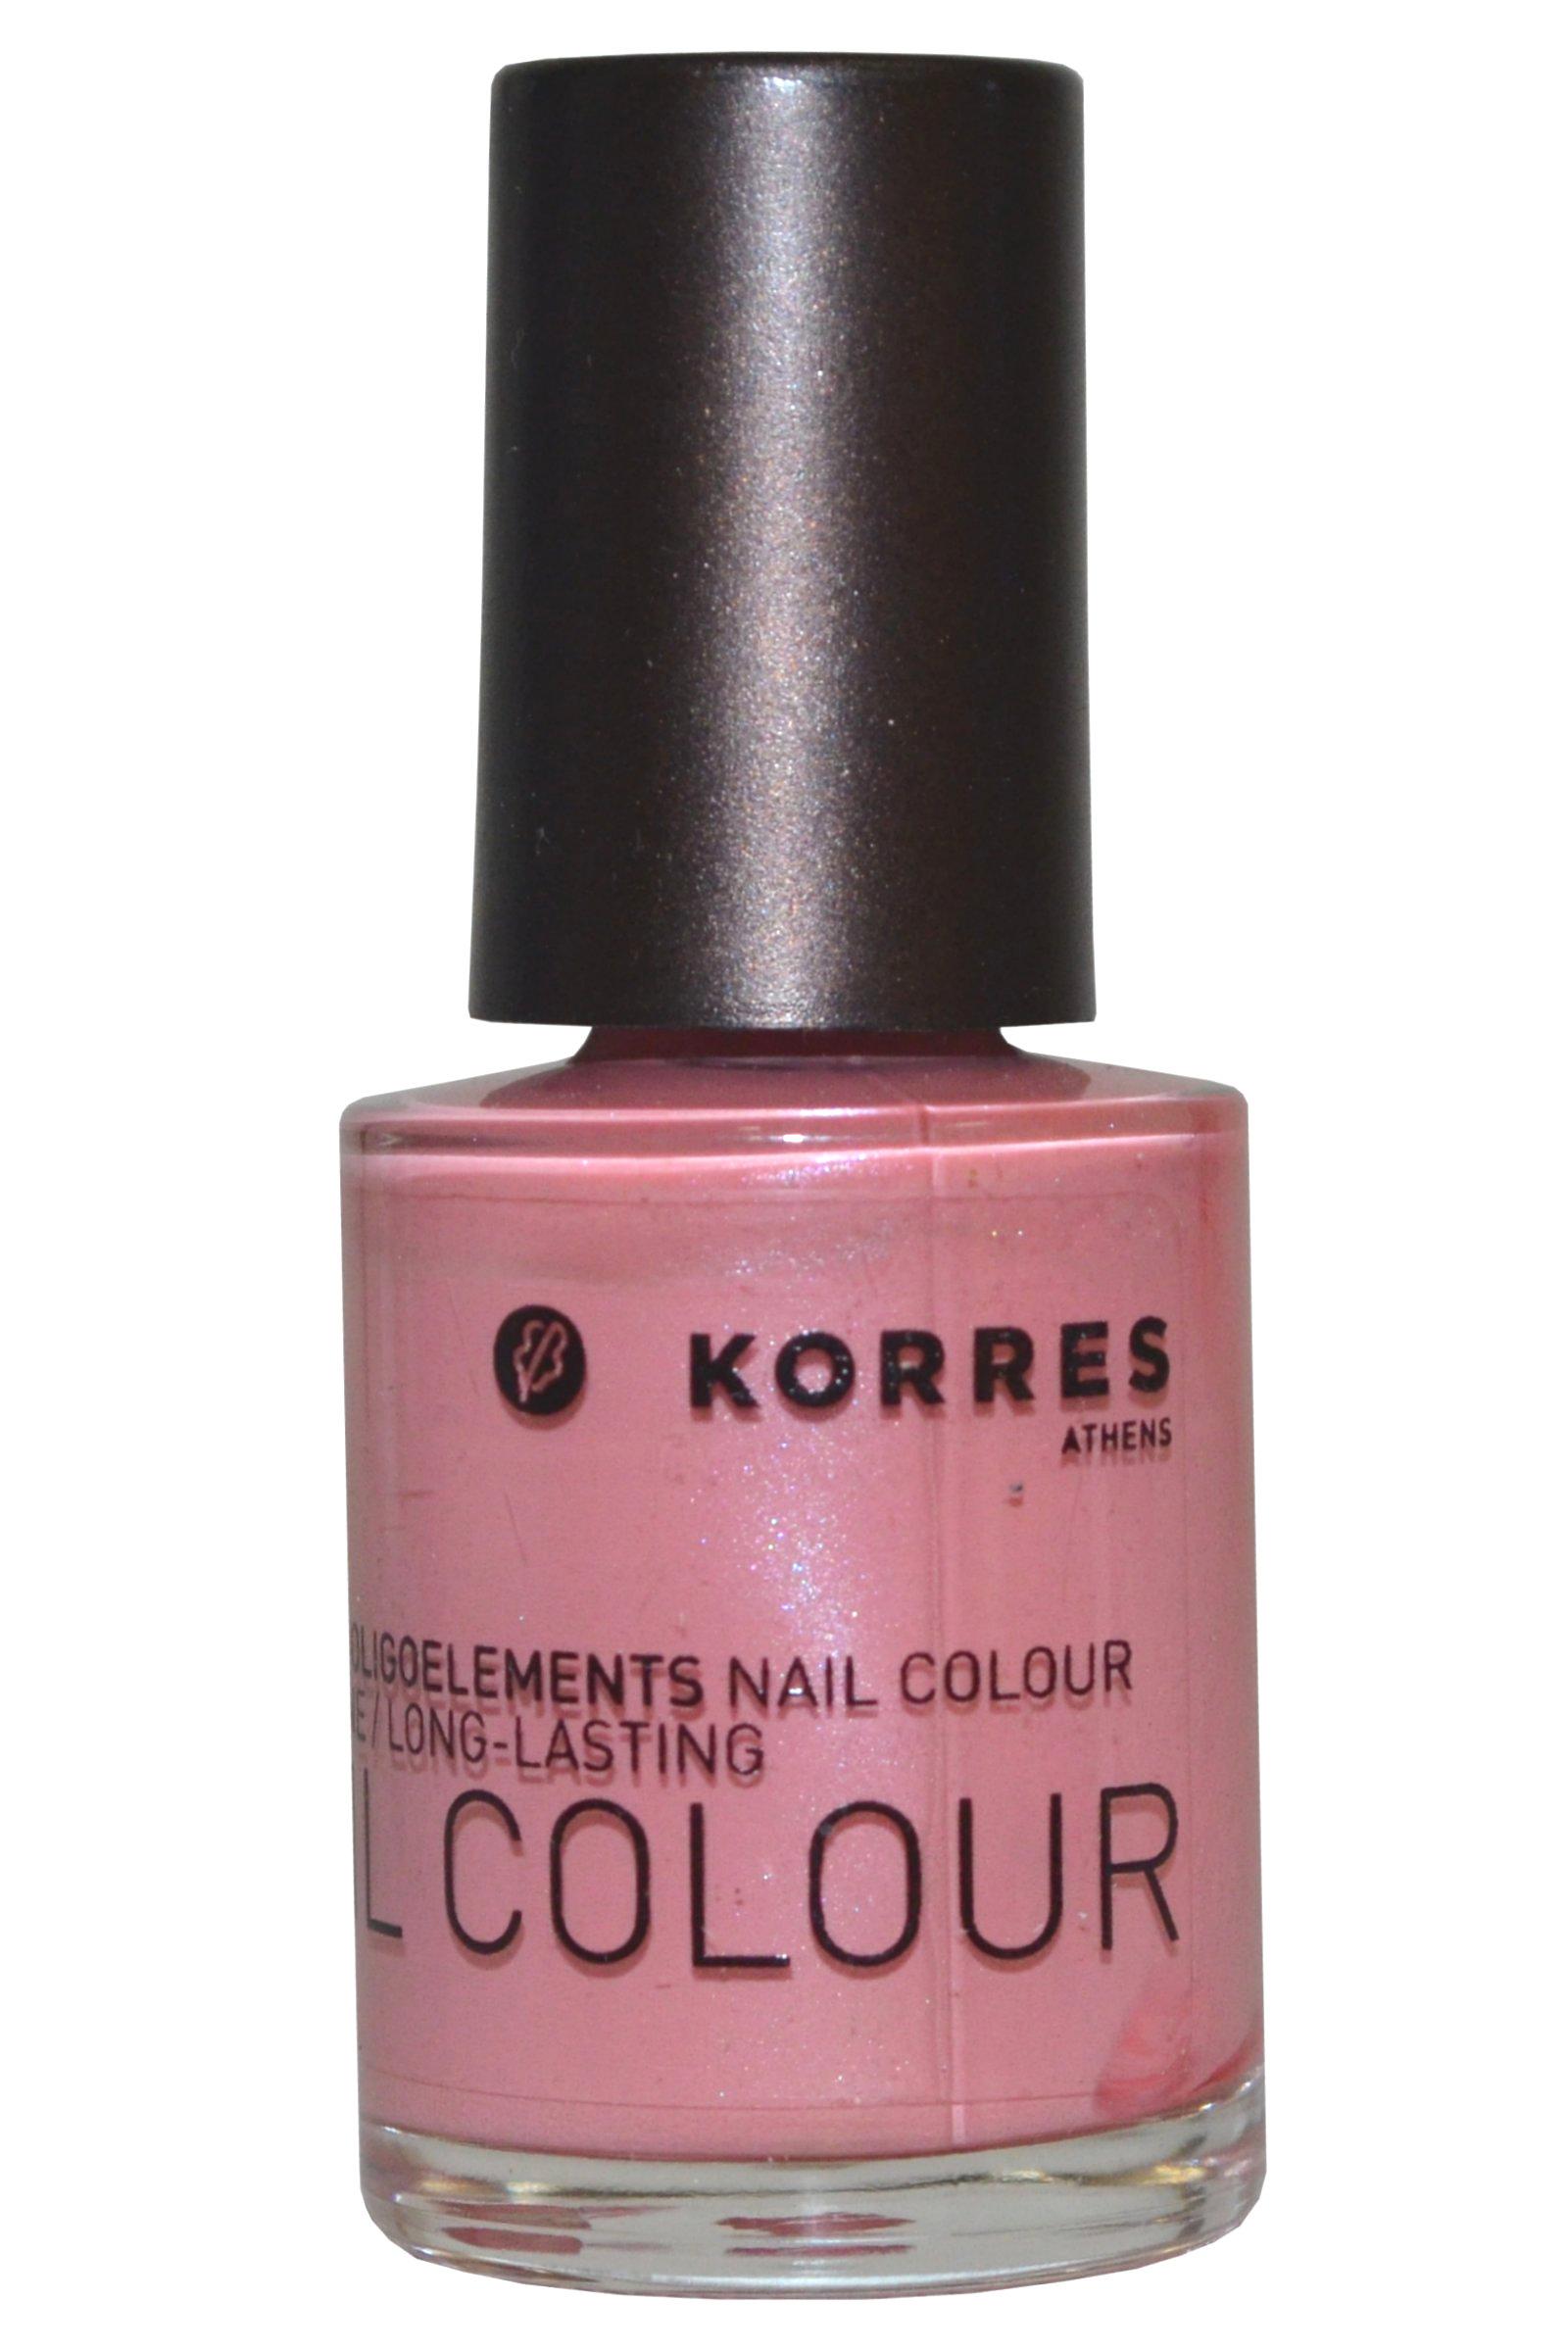 Korres Nail Color High Shine Long Lasting 10ml Sweet Pink (#13)